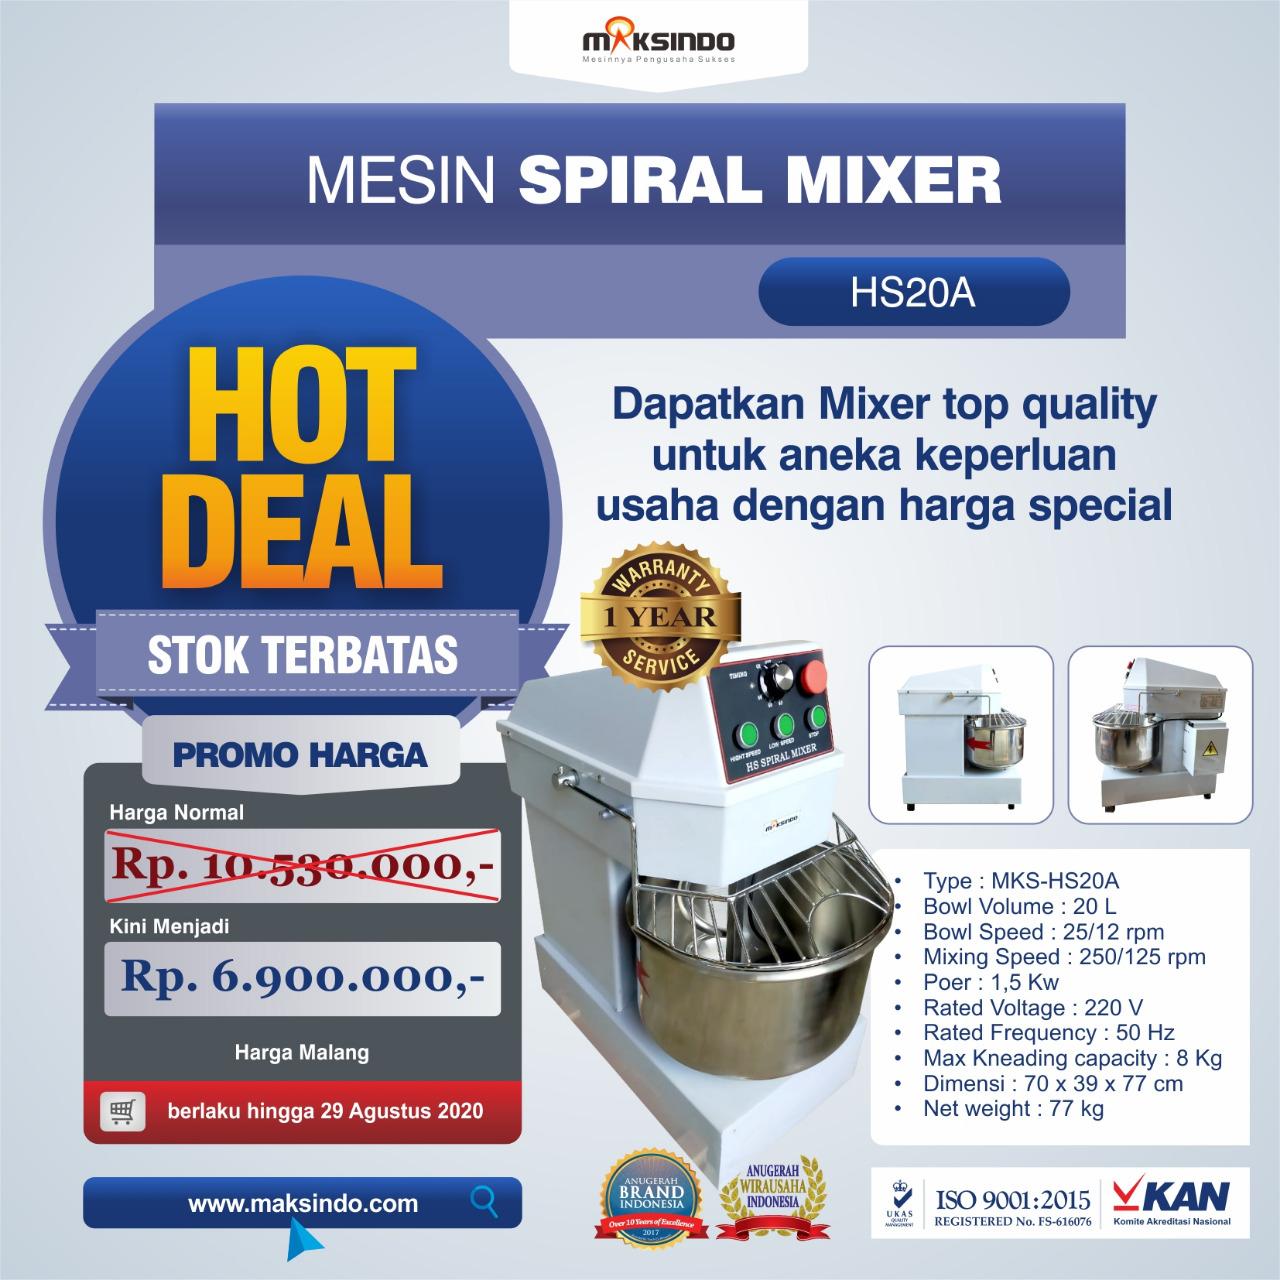 Jual Mesin Mixer Roti SPIRAL MKS-HS20A di Semarang